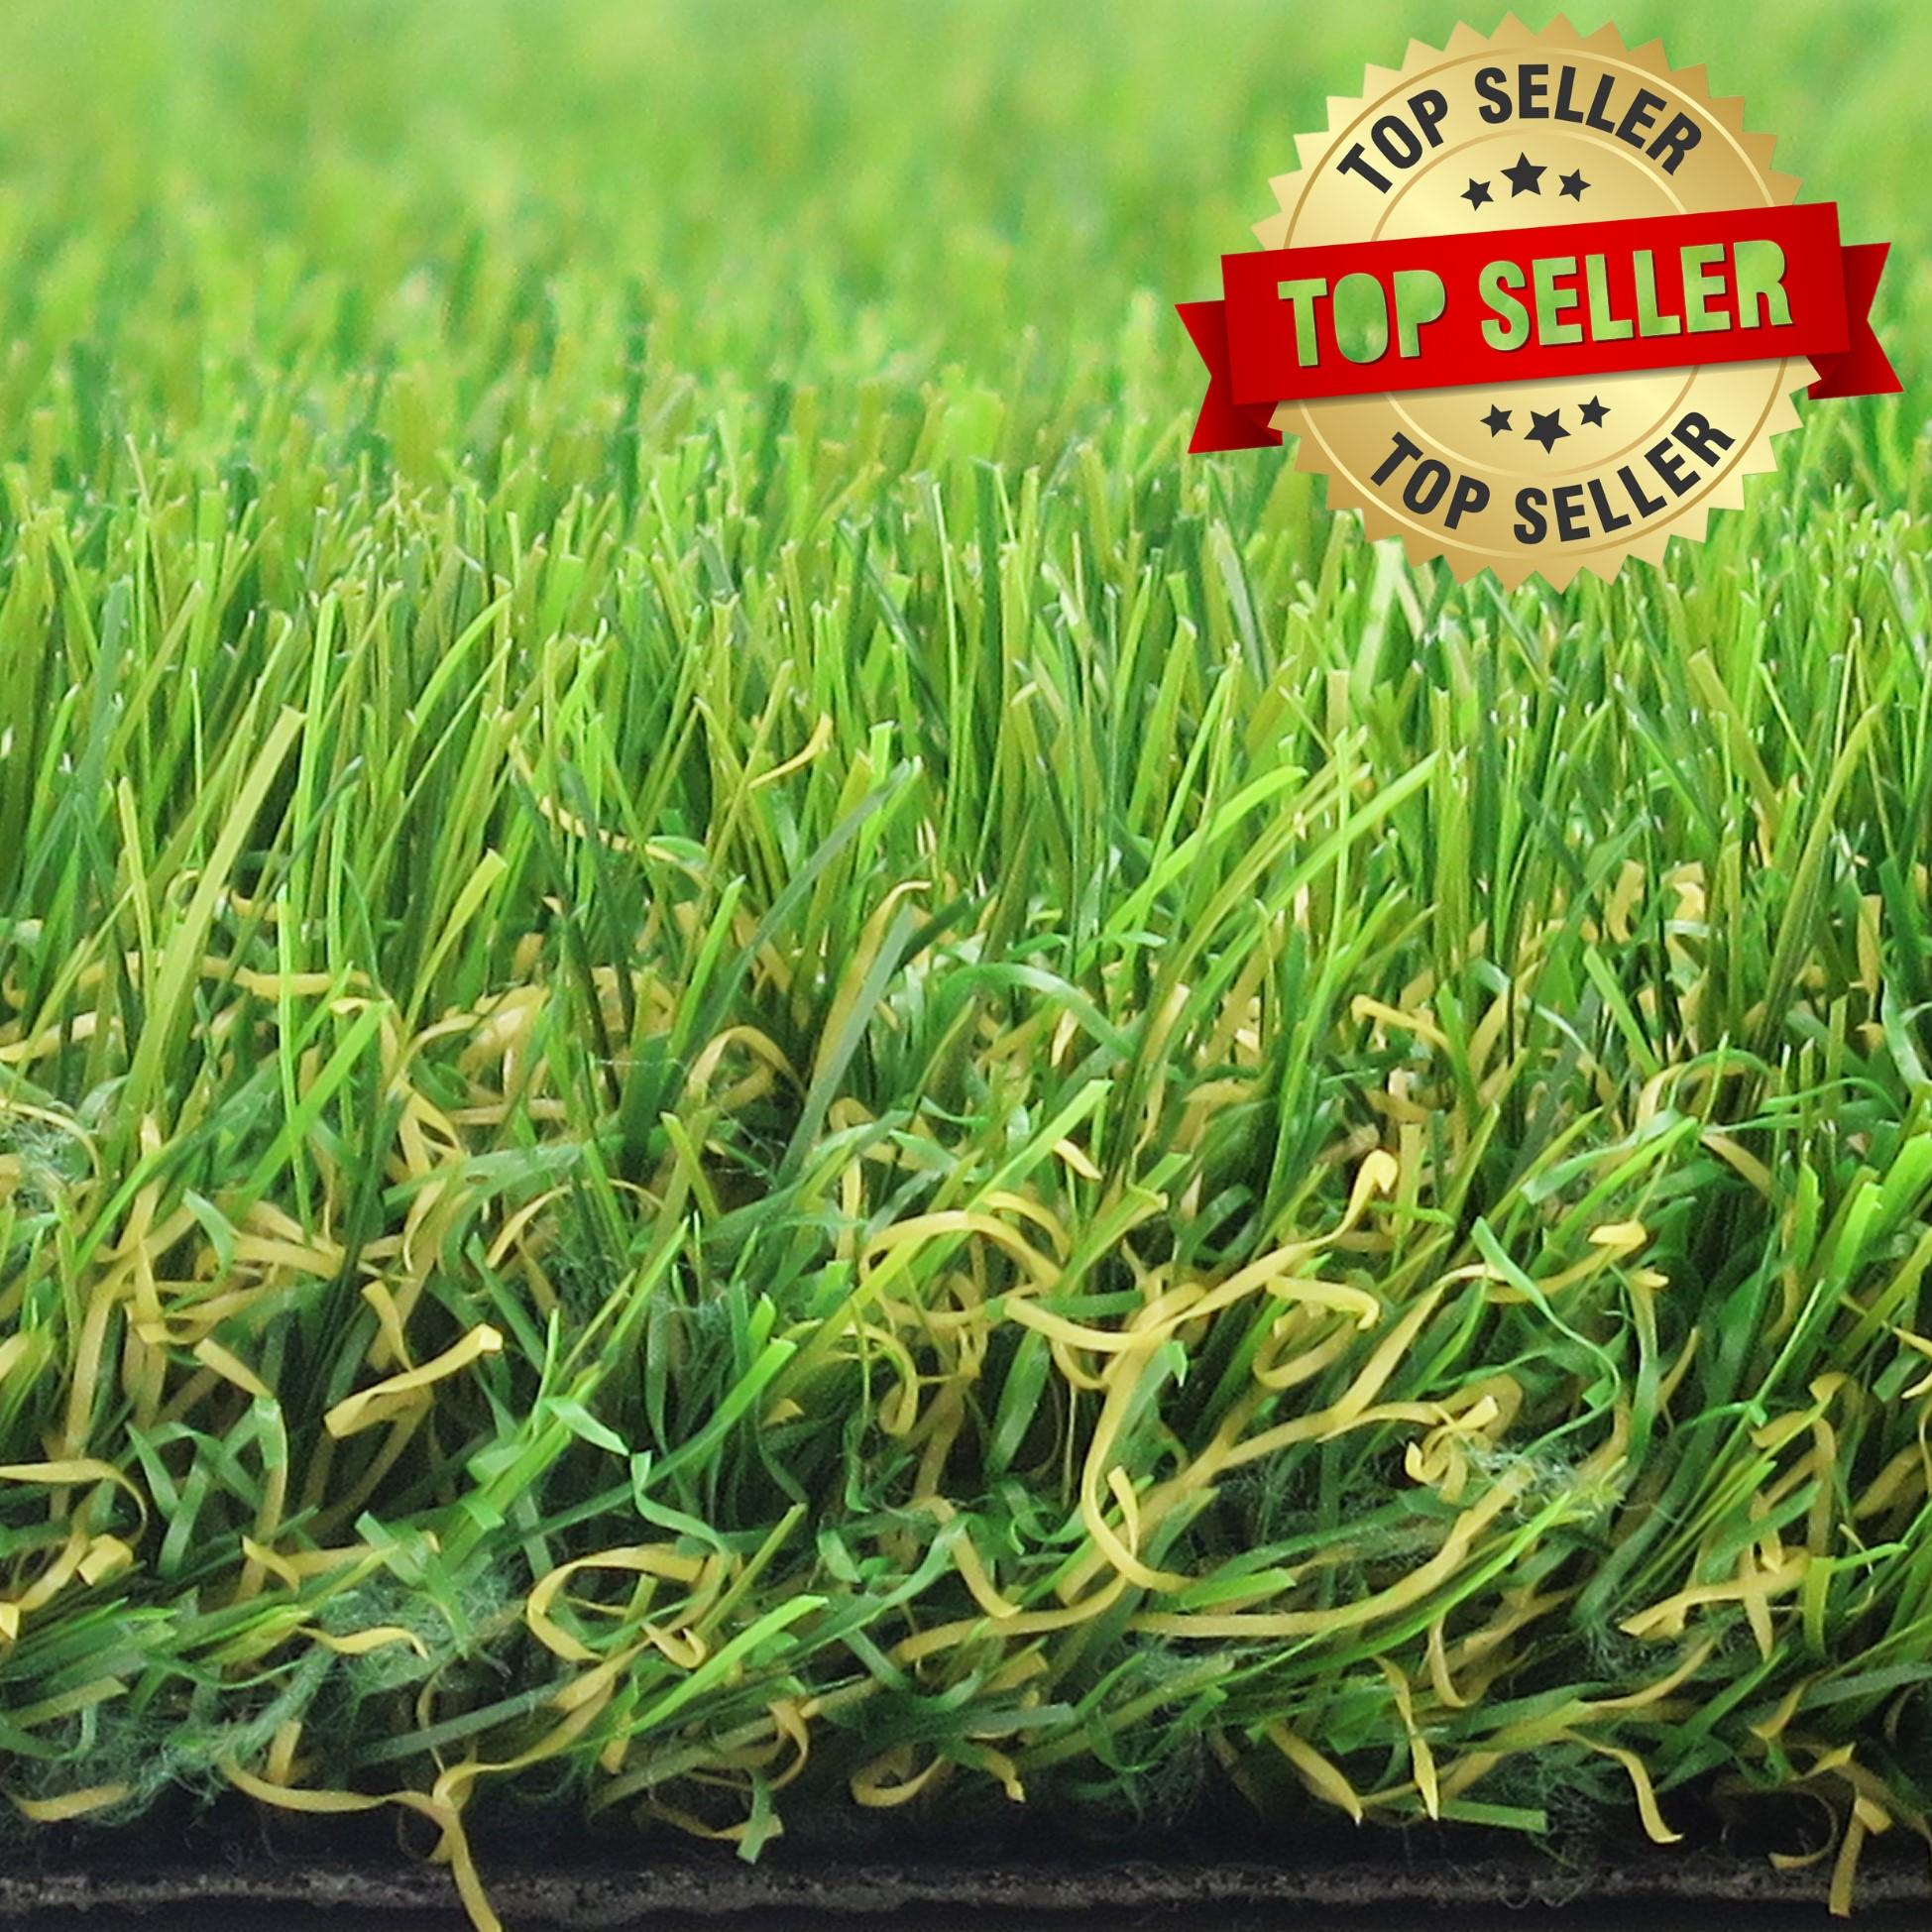 Luxury 38 Artificial Grass 4M